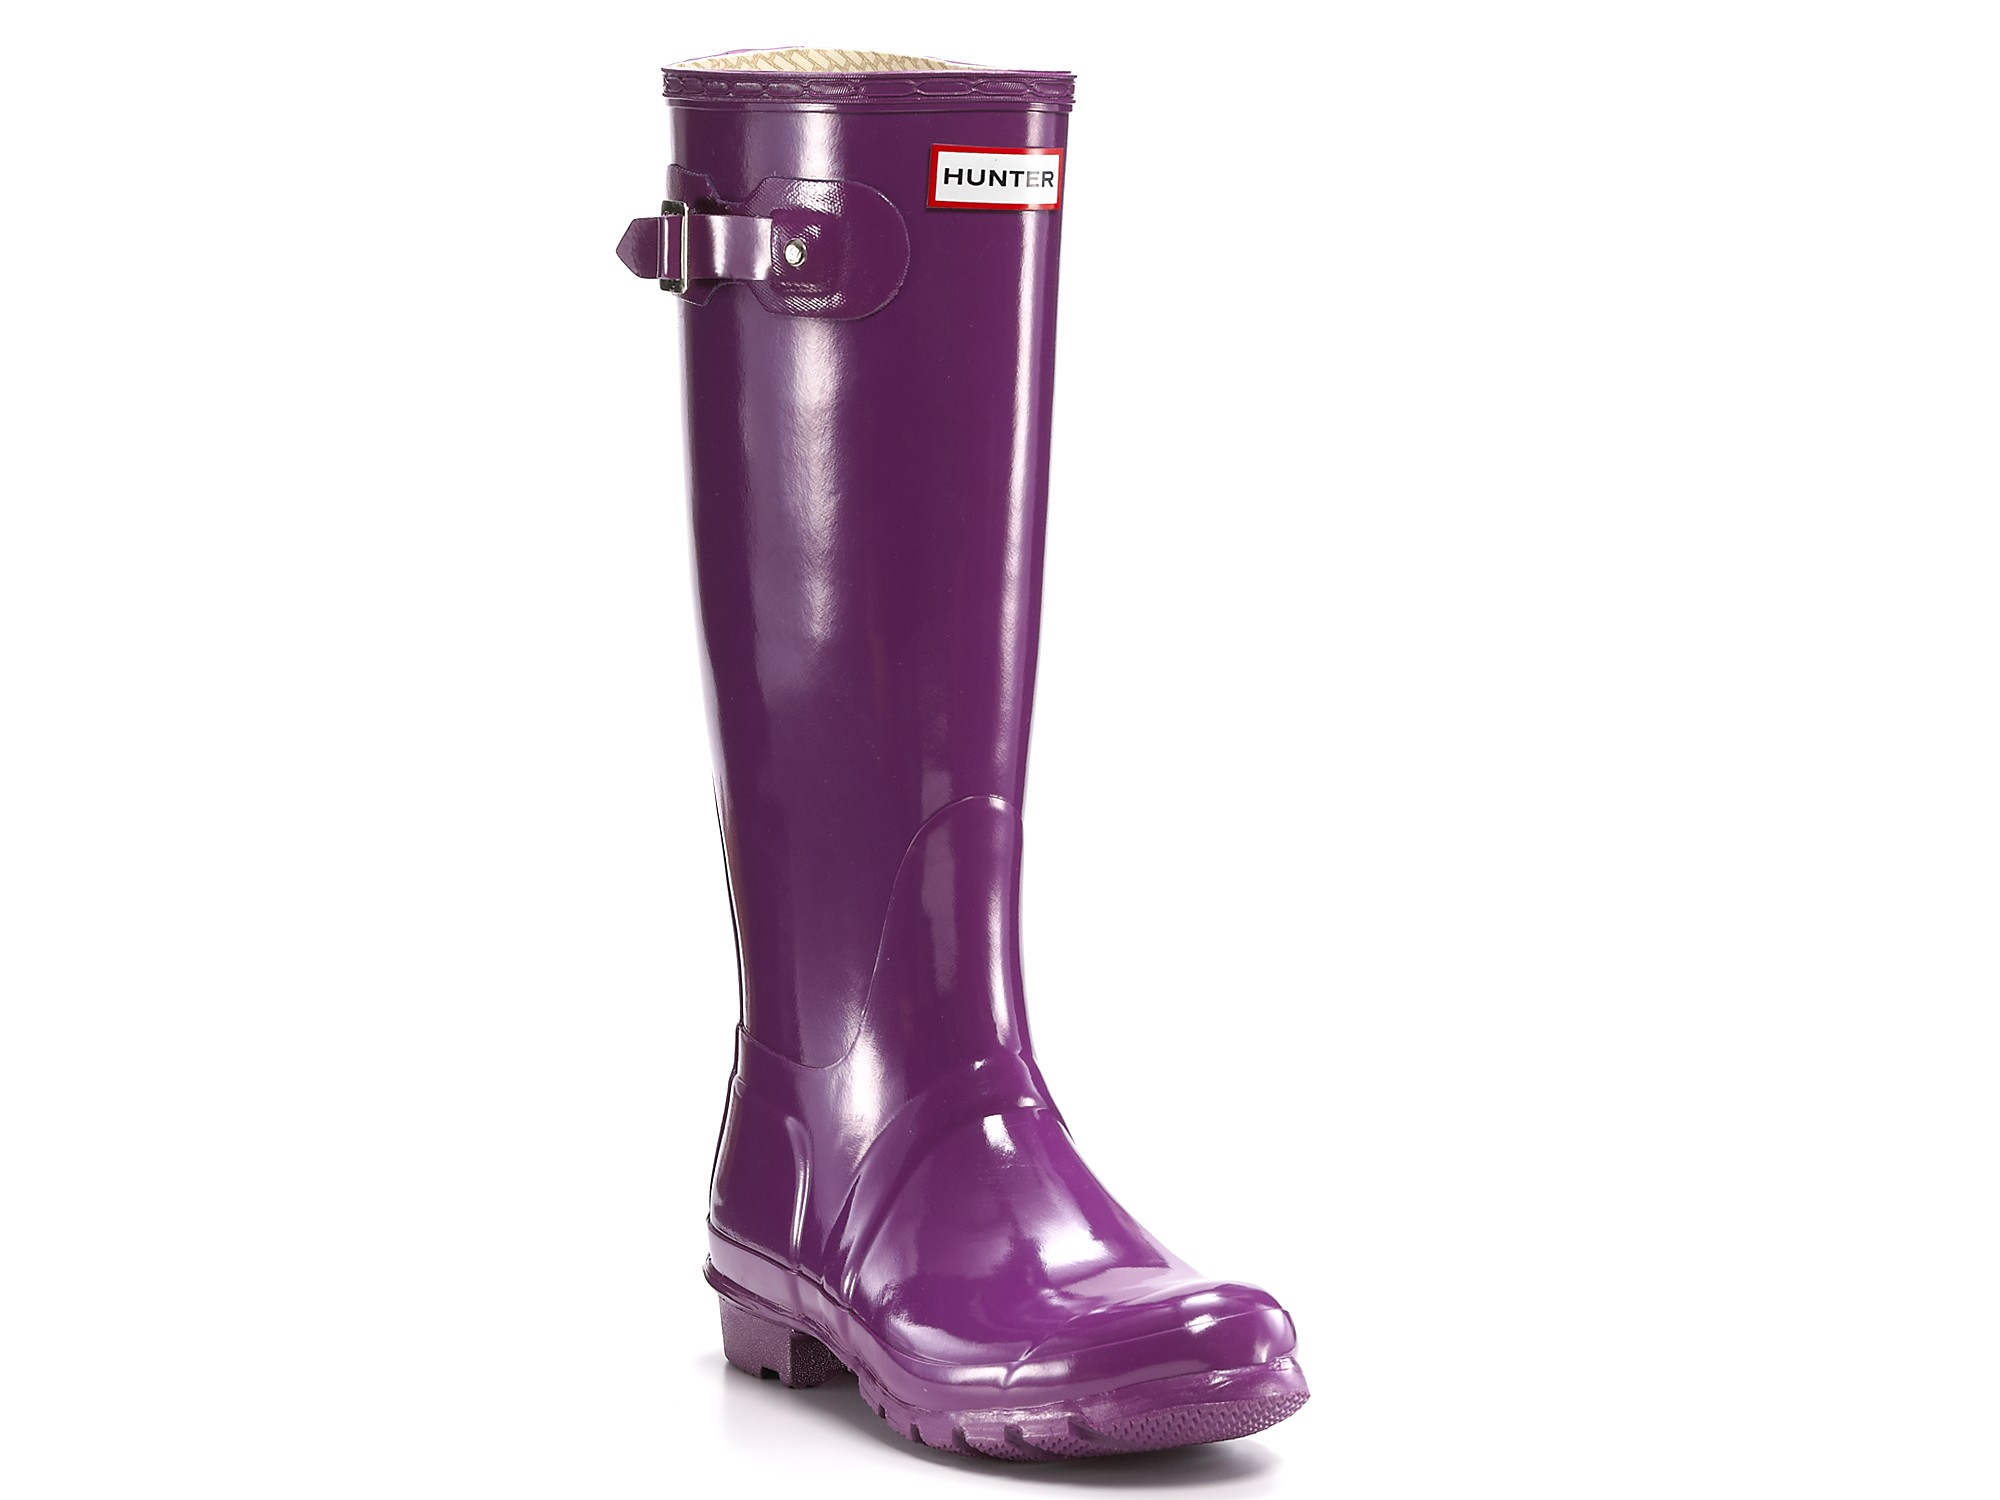 Hunter Womens Original Classic Glossy Rain Boots - Blackberry in ...